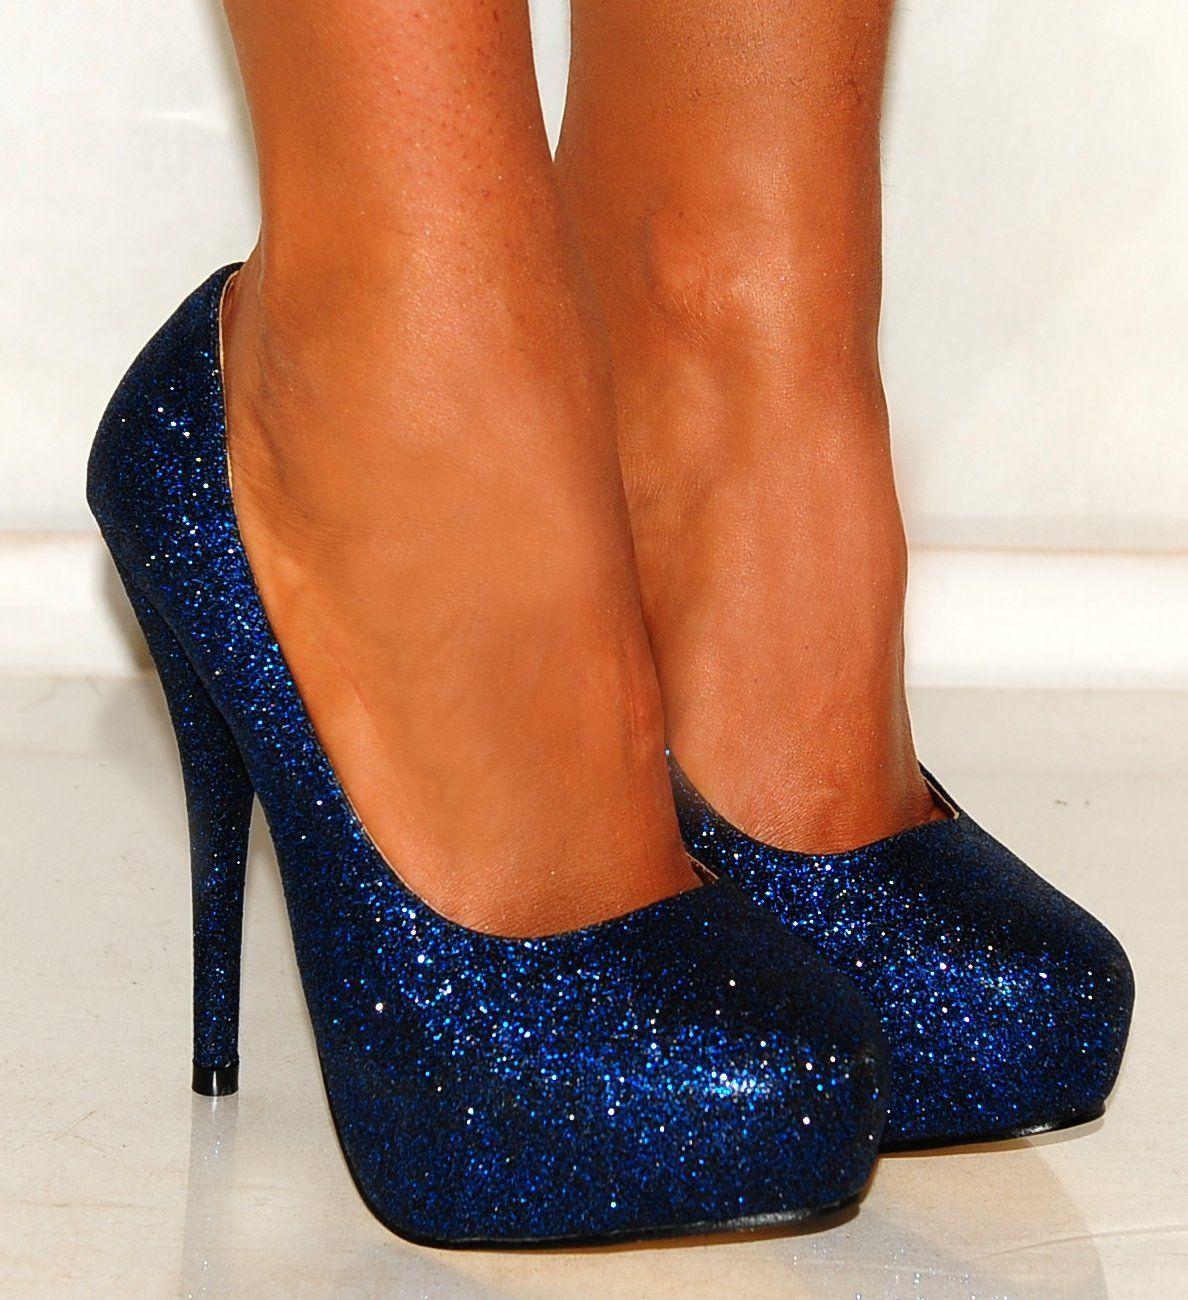 Bright Blue Glitter Court shoes Platforms High Heels ...